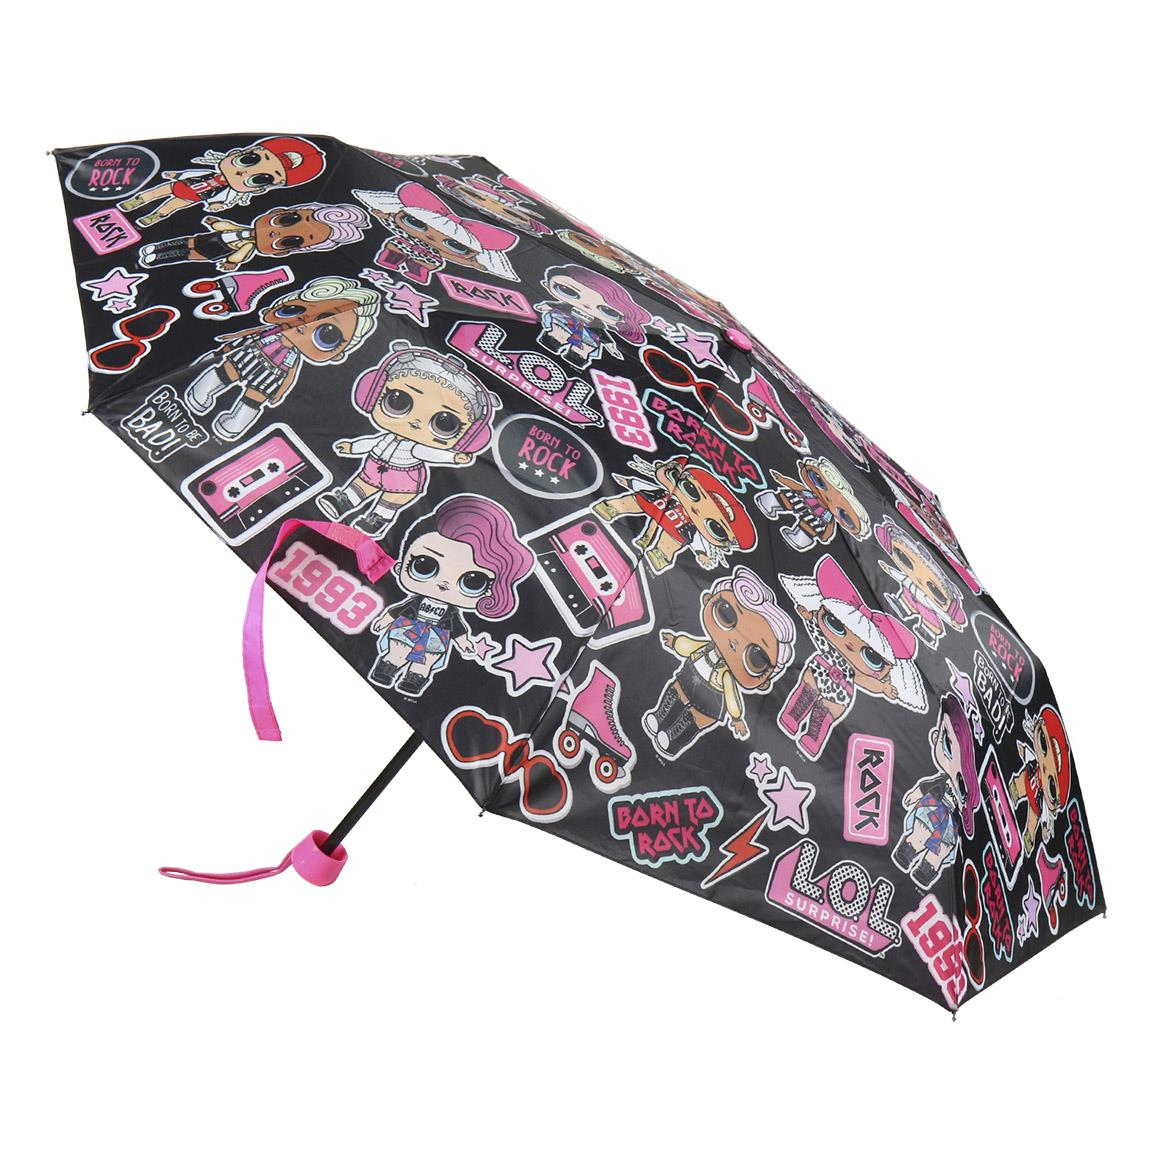 Comprar LOL Guarda-chuva dobrável manual Lol preto